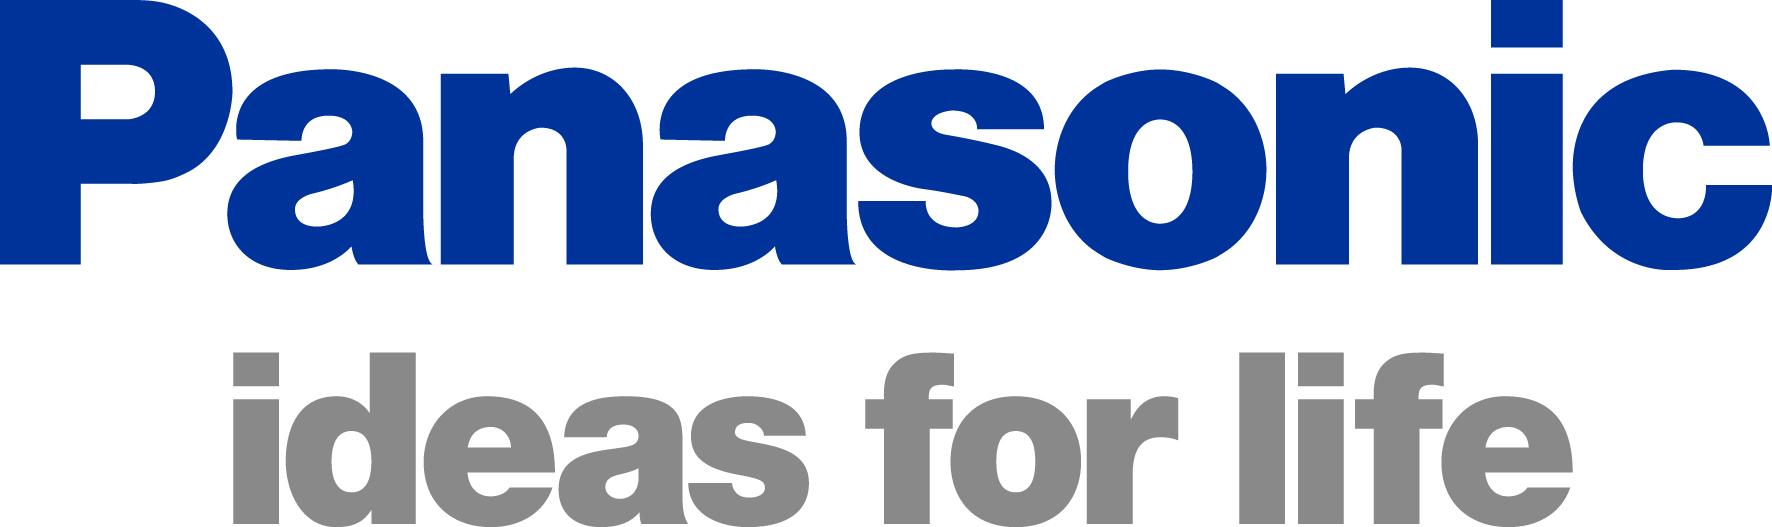 Panasonic F M15a0 Gy Ceiling Fan